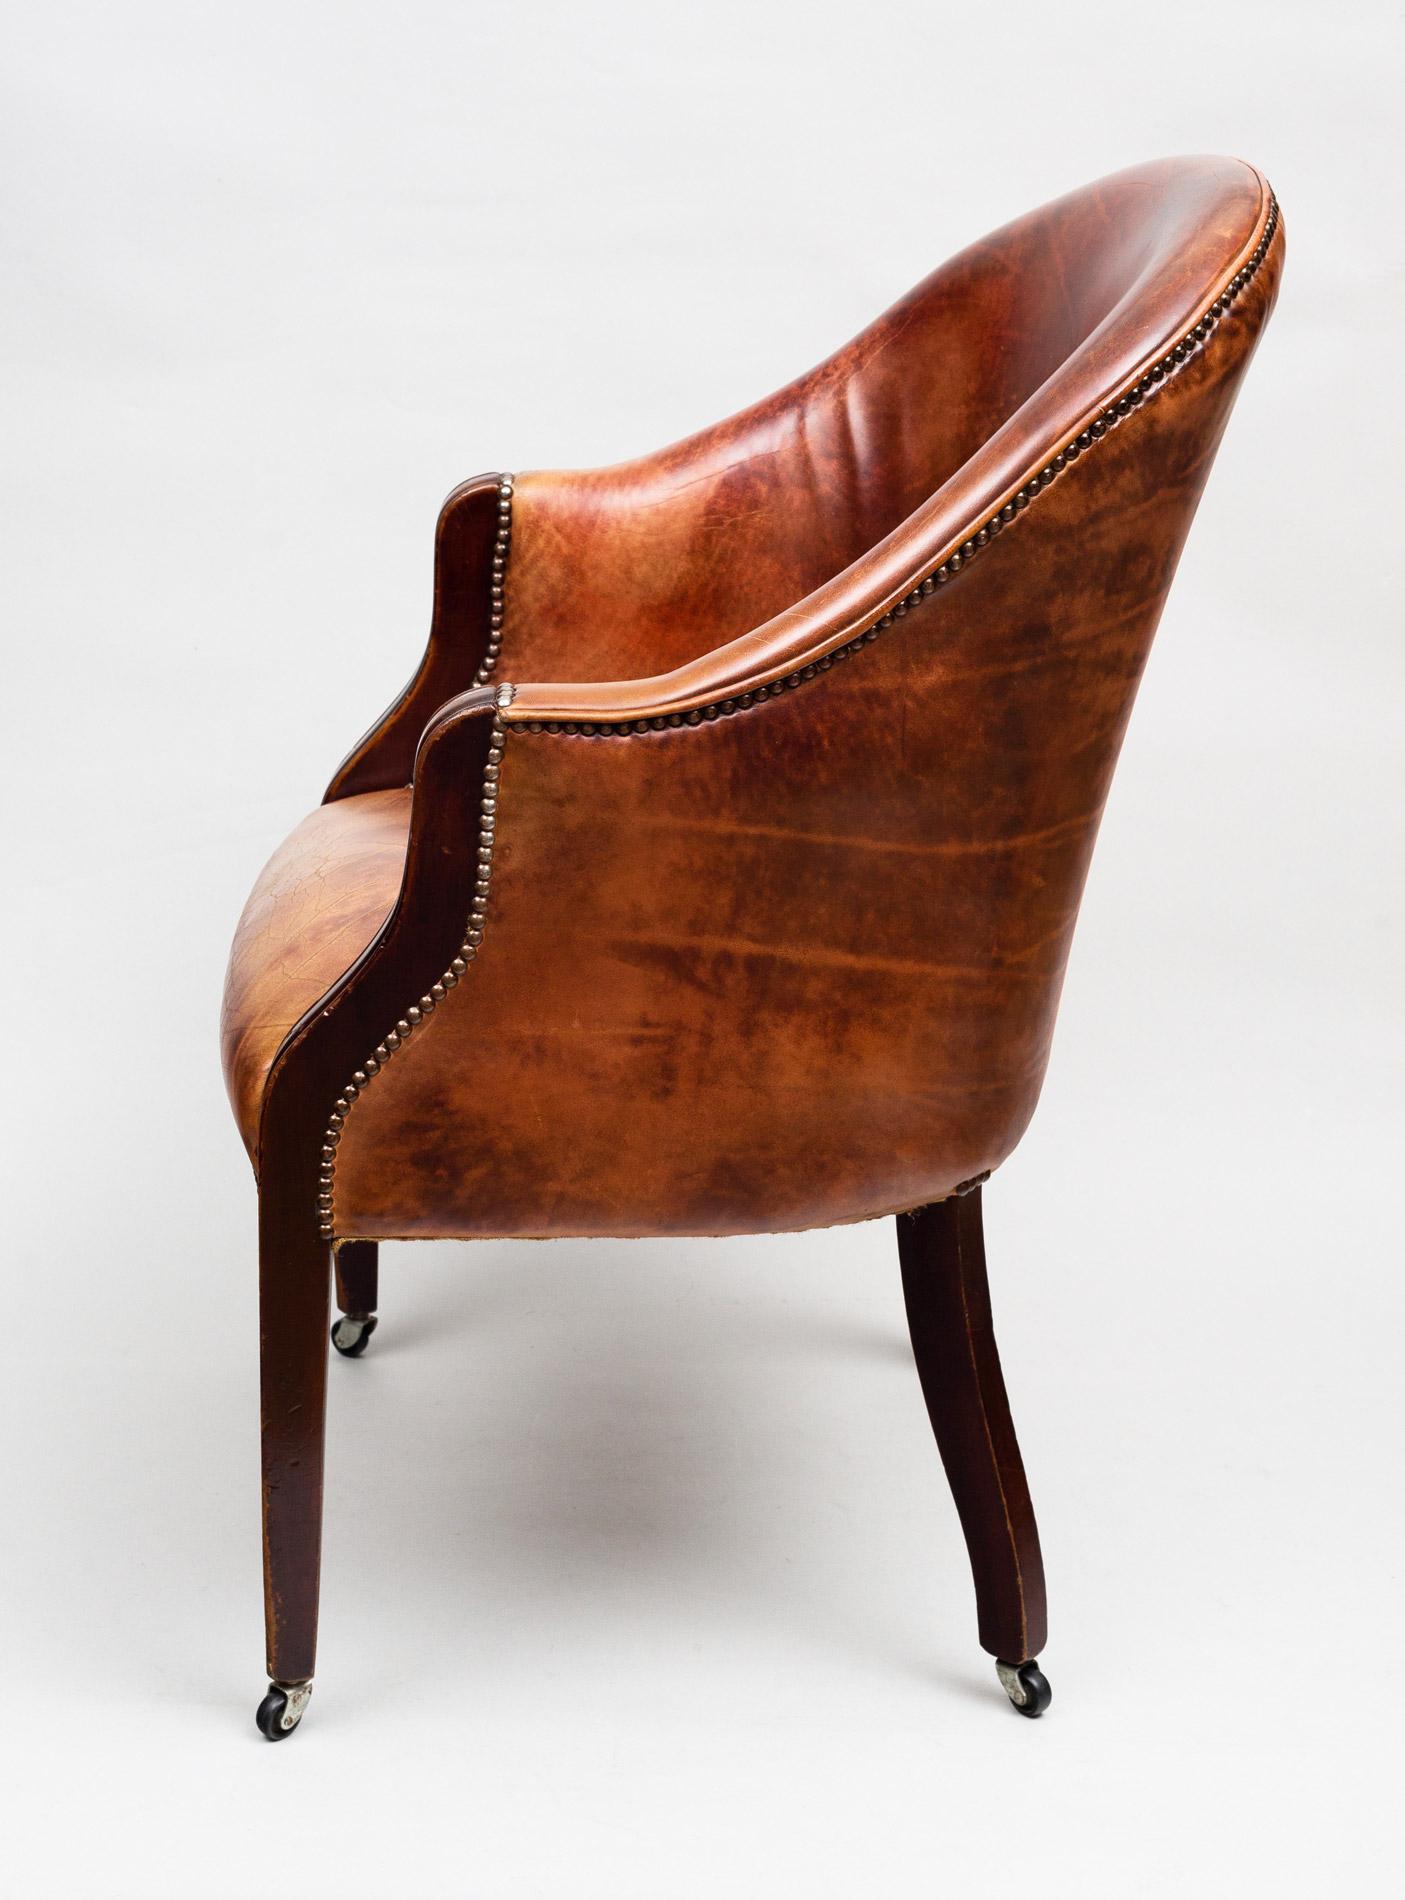 Antique Edwardian Tub Chair Antique Mahogany Leather Tub